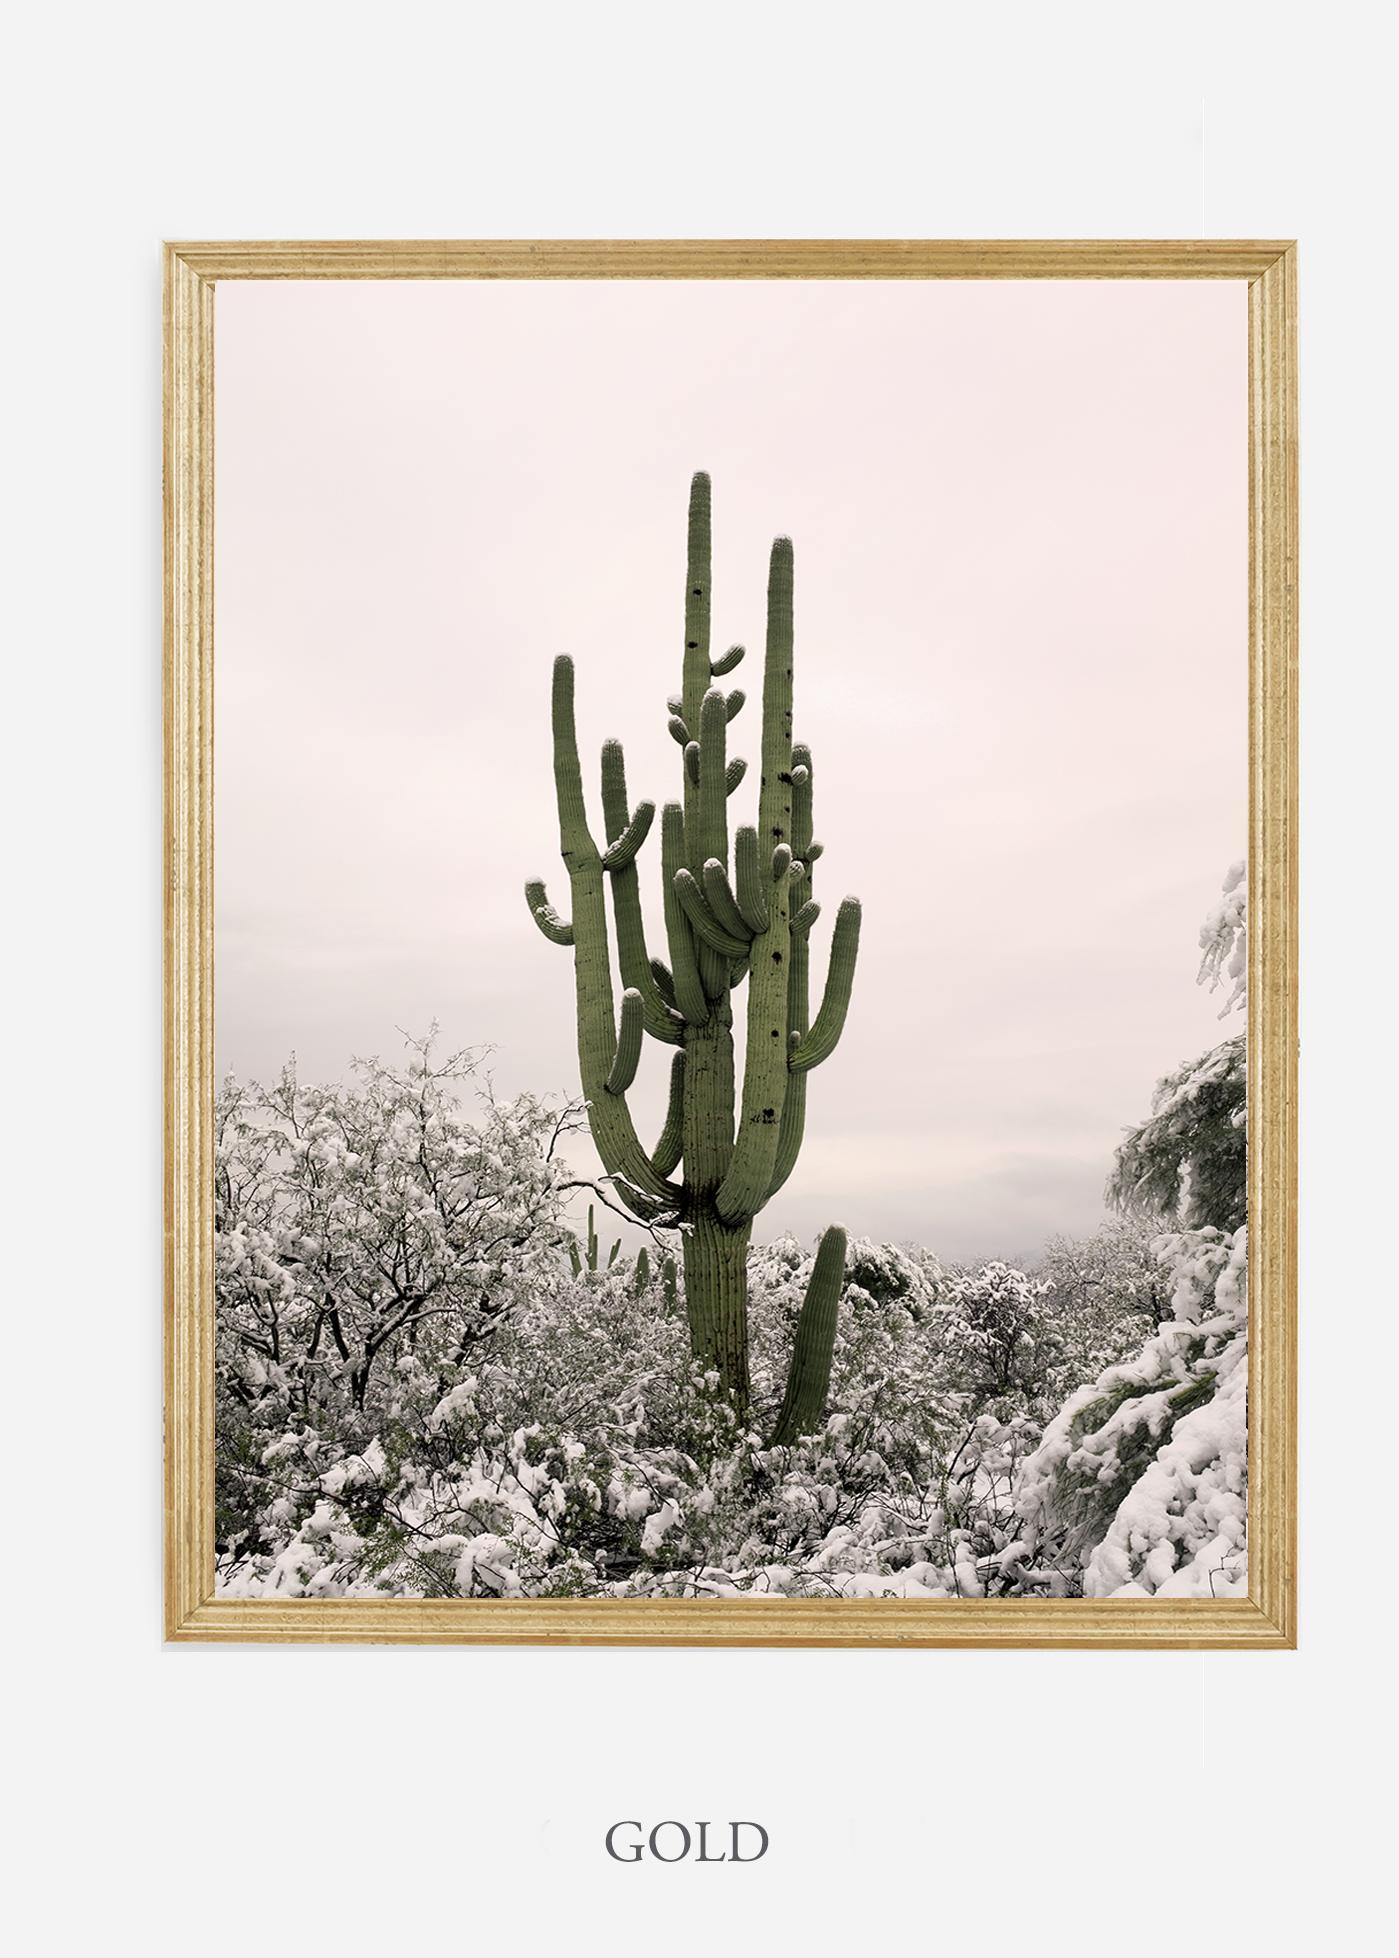 nomat-goldframe-saguaroNo.8-wildercalifornia-art-wallart-cactusprint-homedecor-prints-arizona-botanical-artwork-interiordesign.jpg